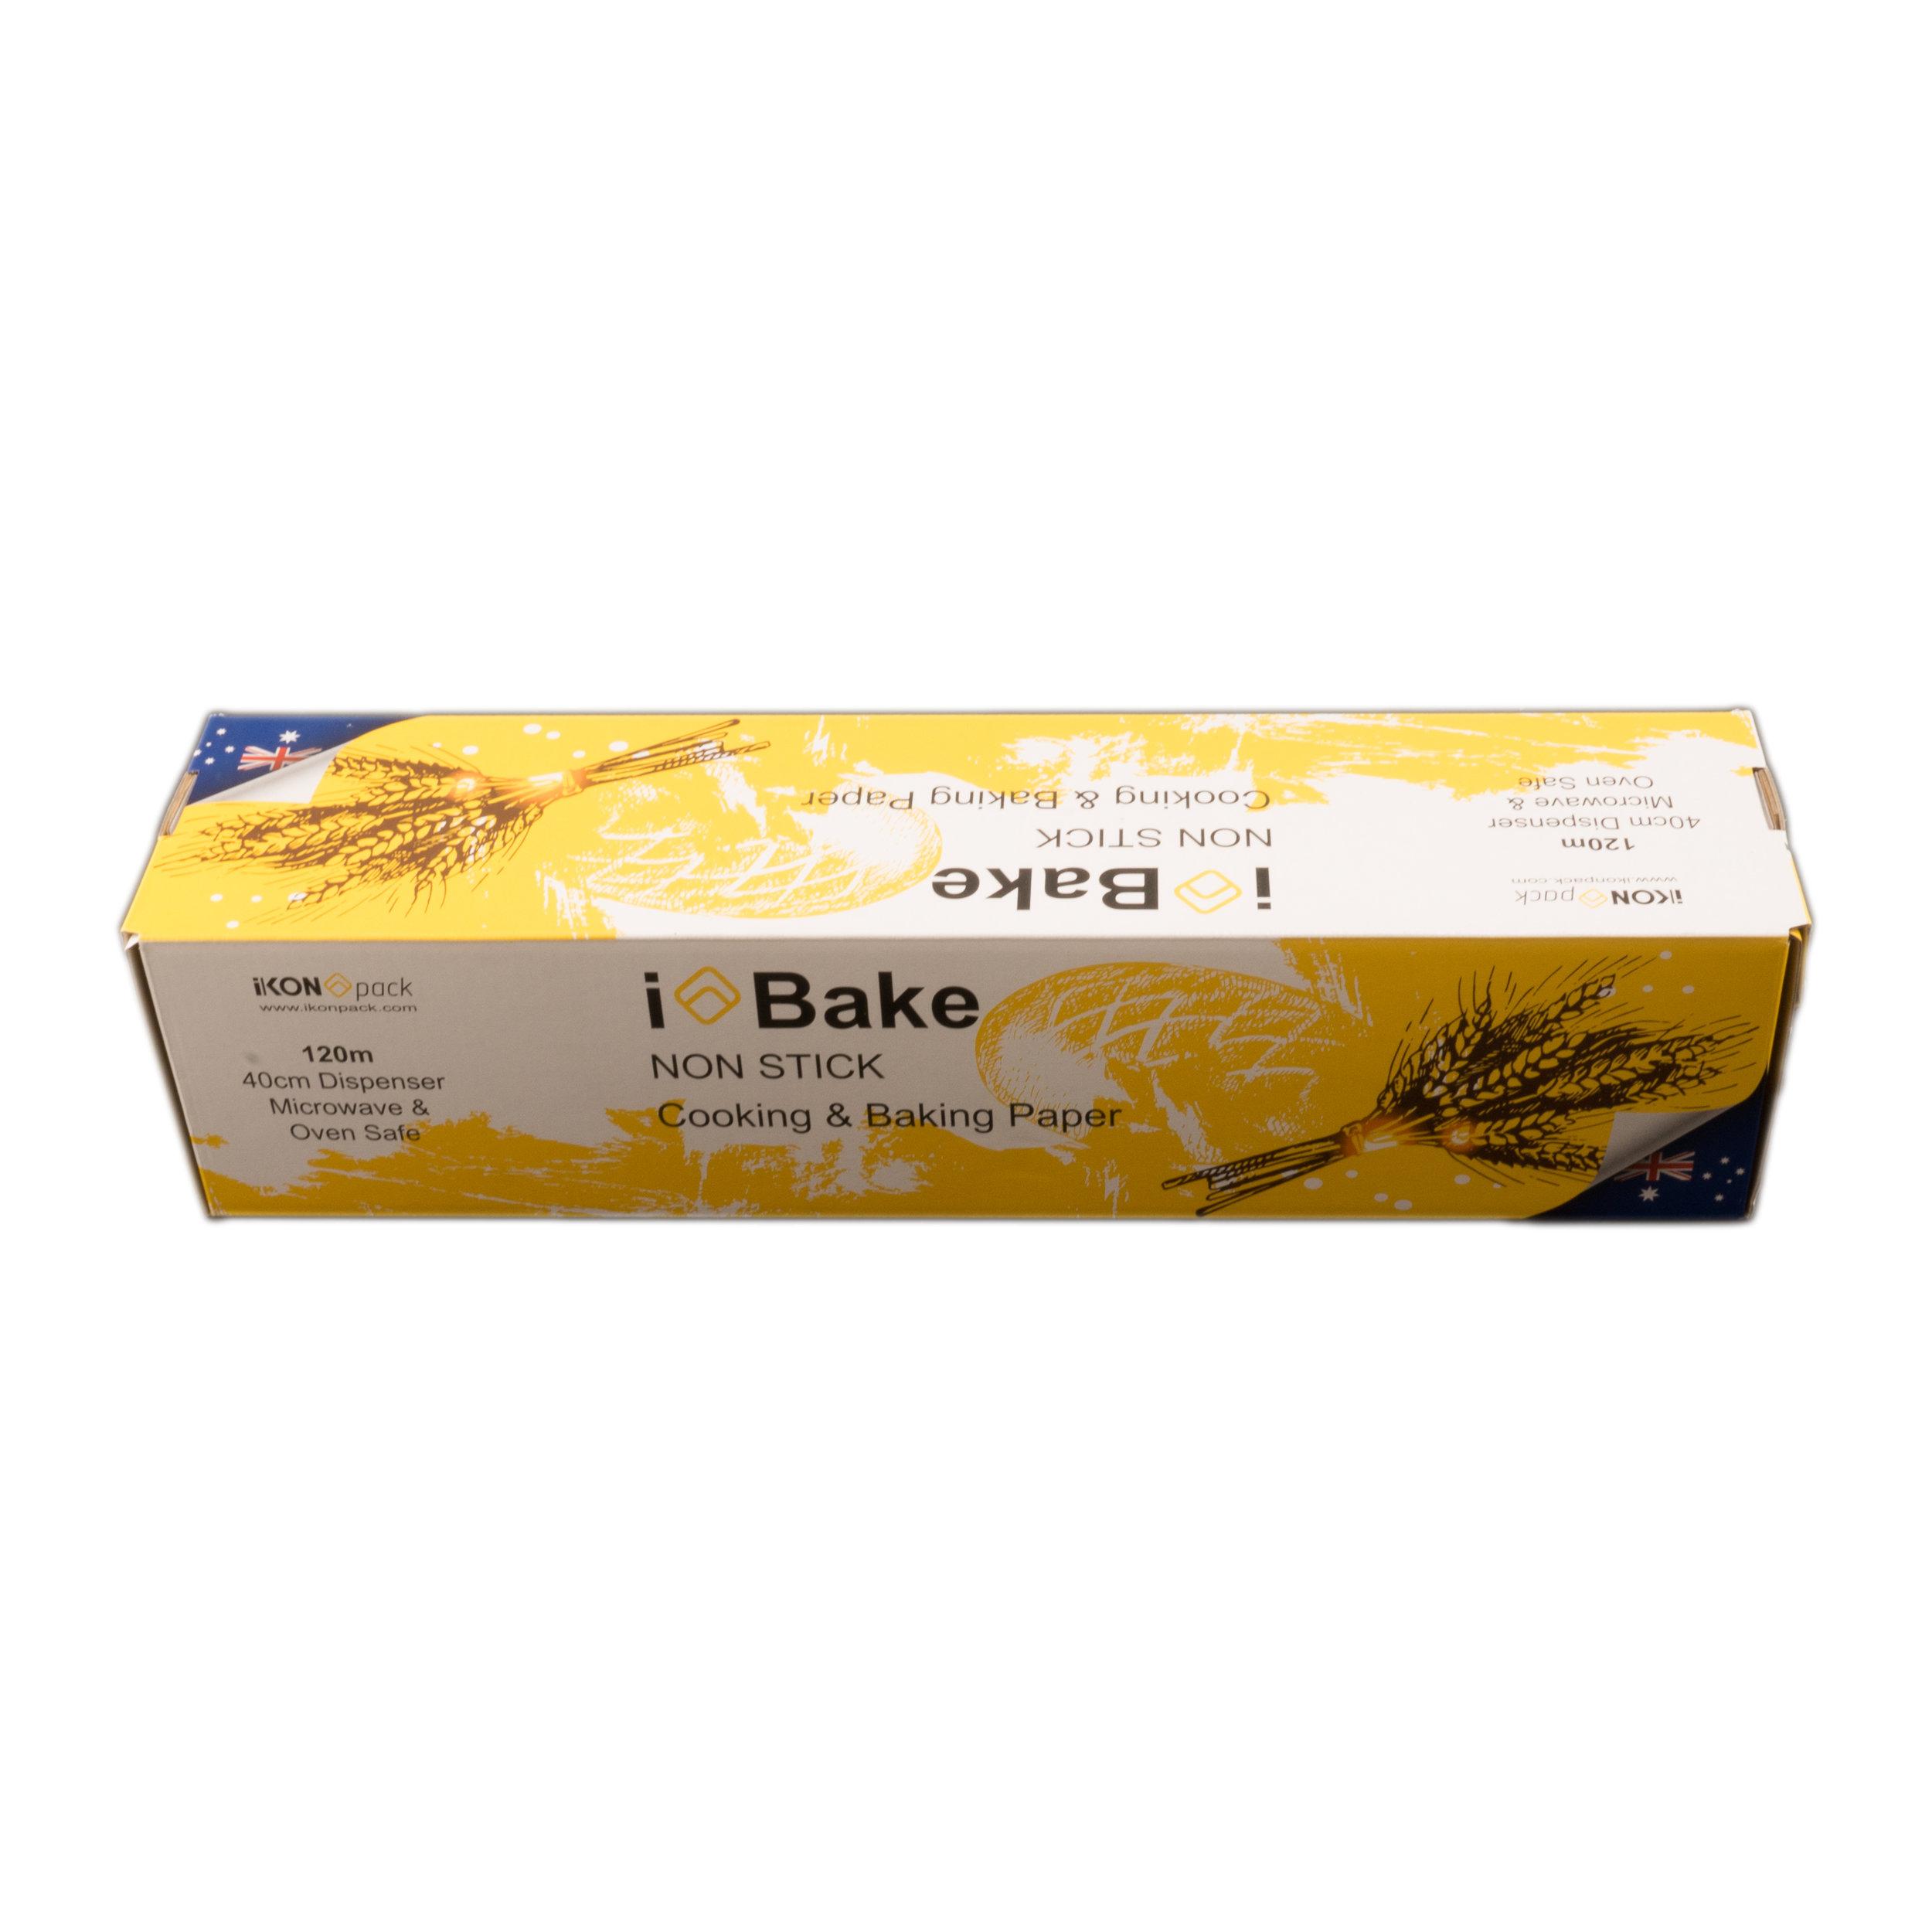 iK-BAKE 40      iBAKE NON STICK - COOKING & BAKING PAPER    40cm x 120m Roll 4 rolls per carton